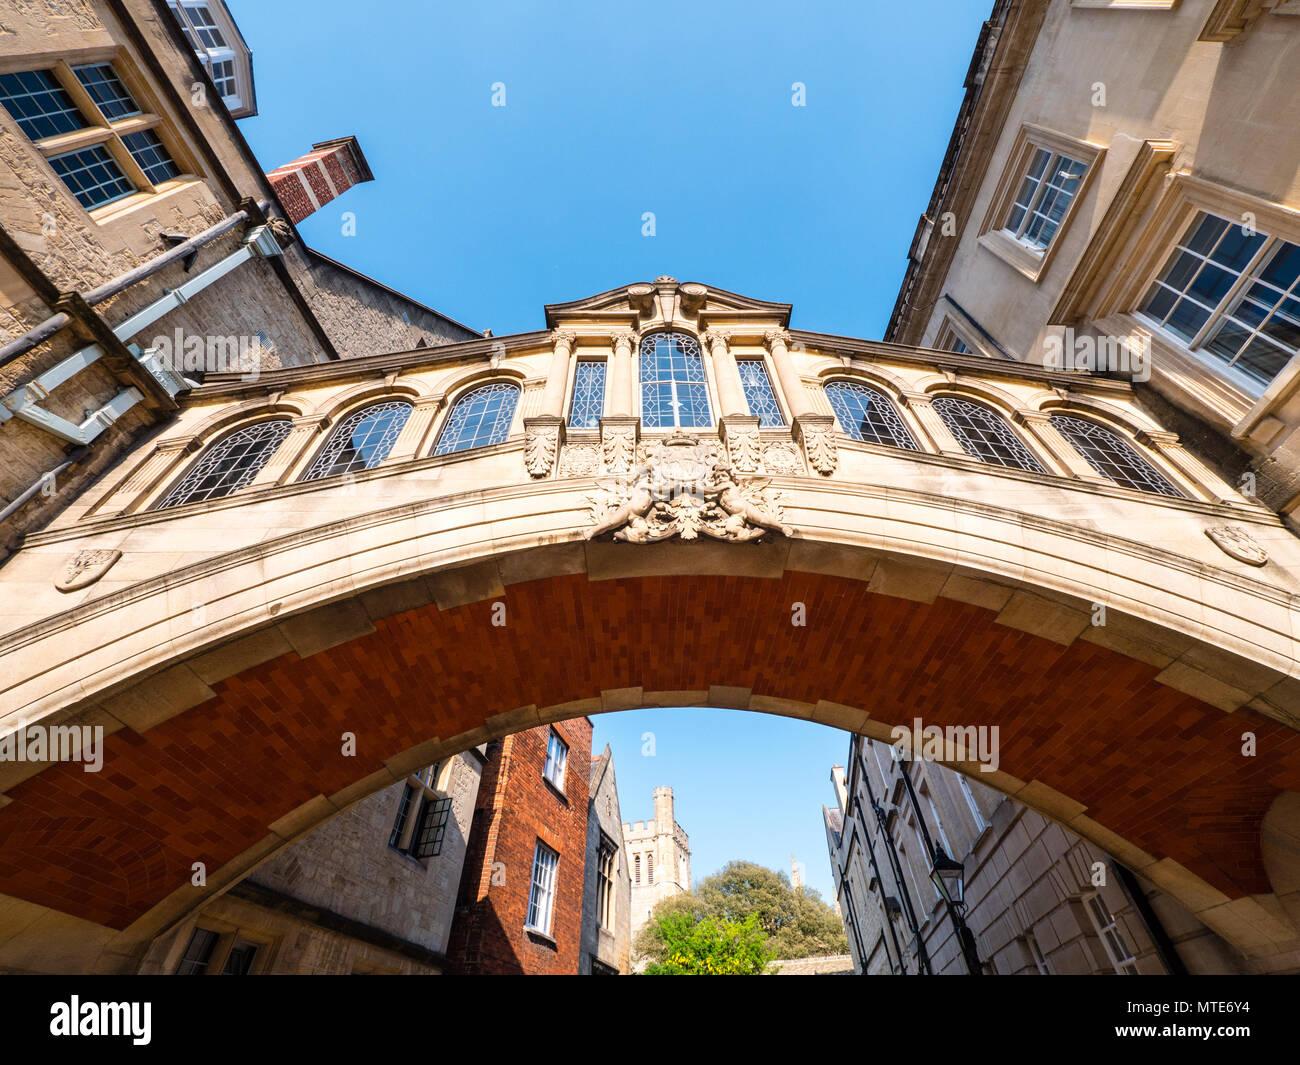 Die Seufzerbrücke, Oxford Sehenswürdigkeiten, Hertford College, Oxford, Oxfordshire, England, UK, GB. Stockbild